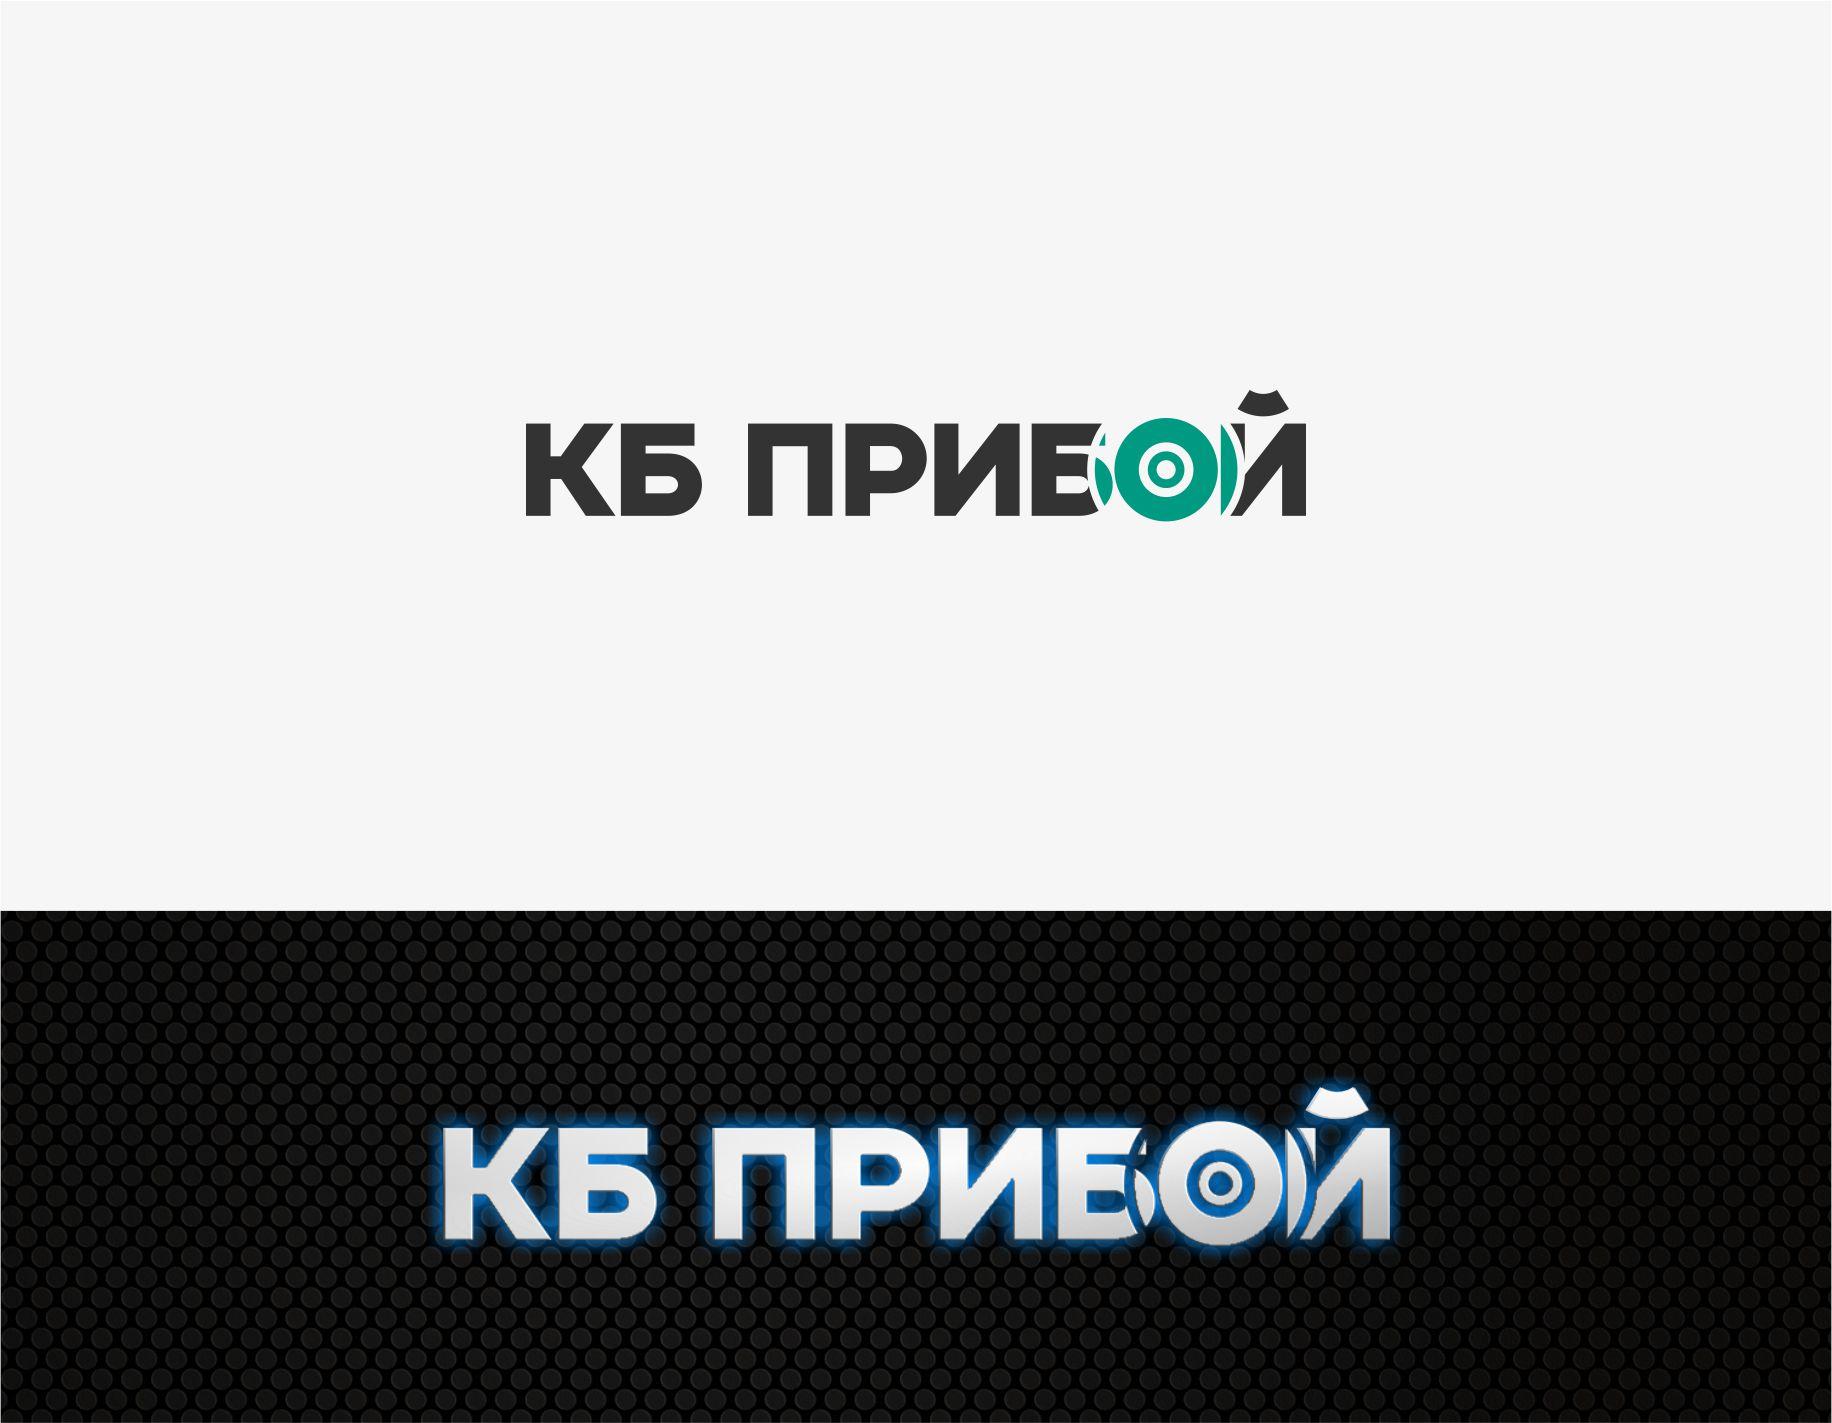 Разработка логотипа и фирменного стиля для КБ Прибой фото f_3445b24fbb860224.jpg